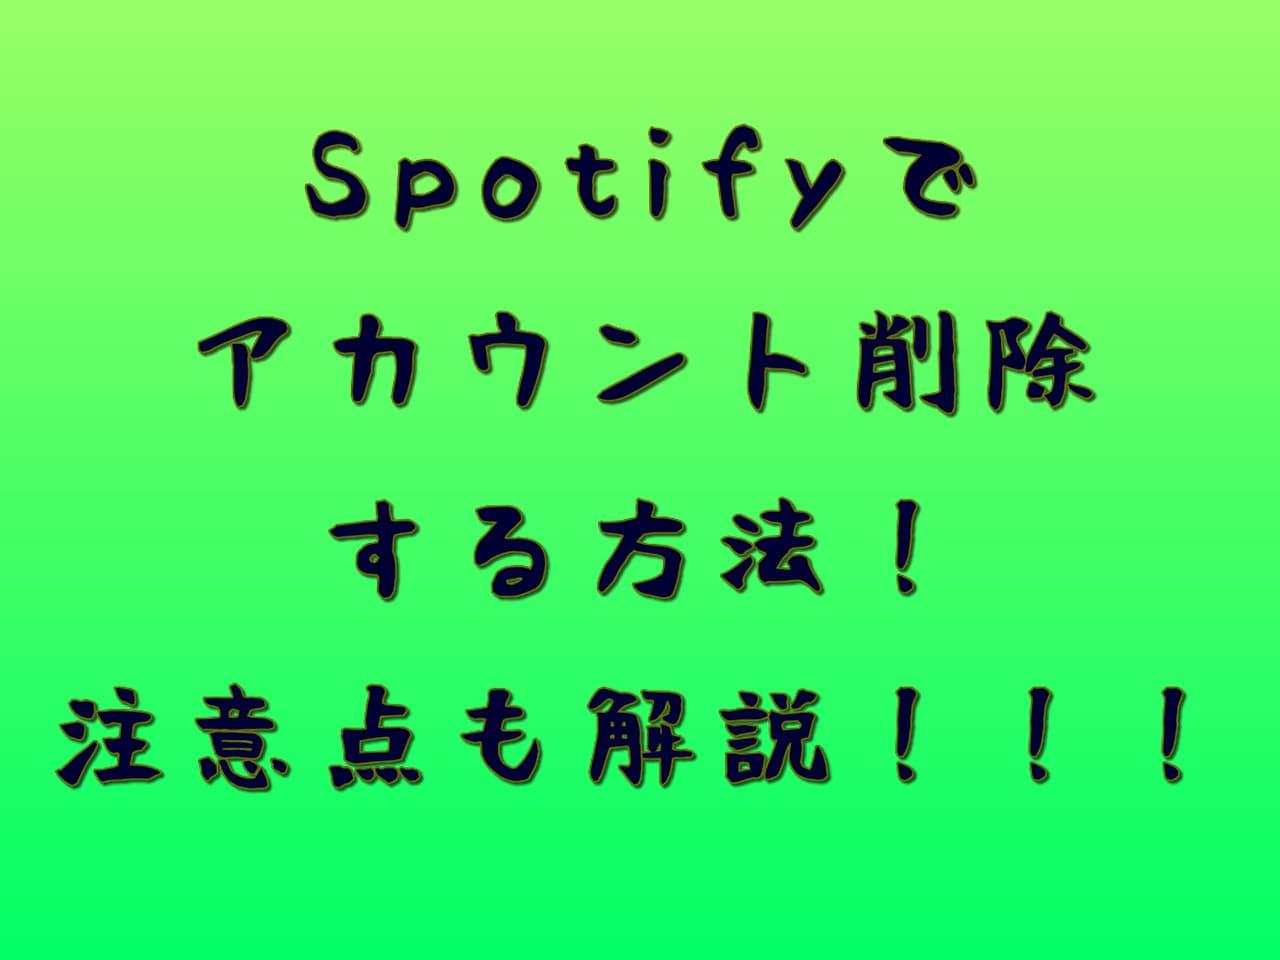 Spotifyでアカウント削除する方法!注意点も解説